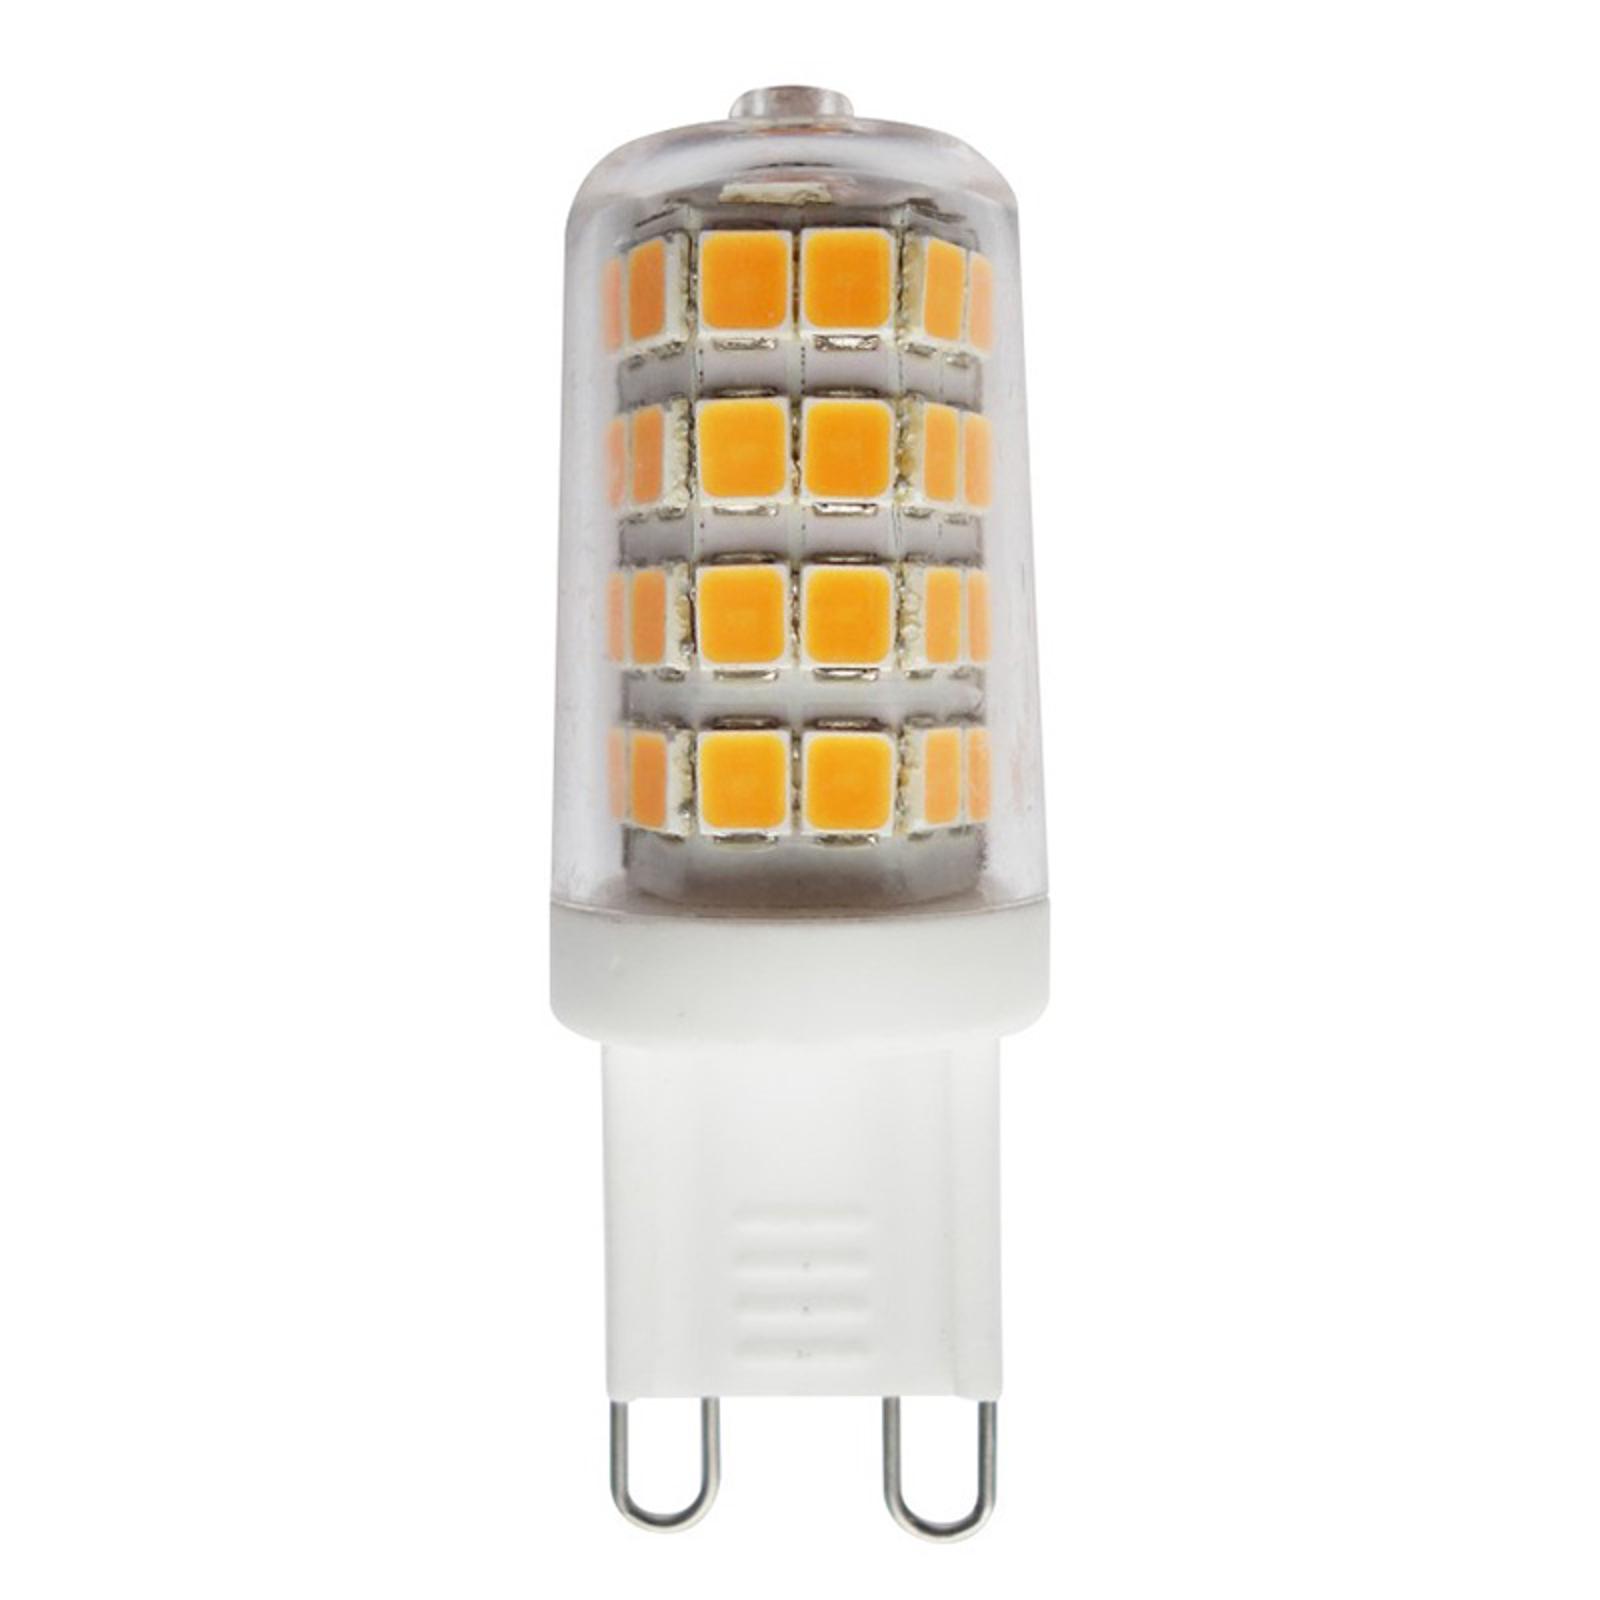 LED-stiftpære G9 3 W 2°700 K klar